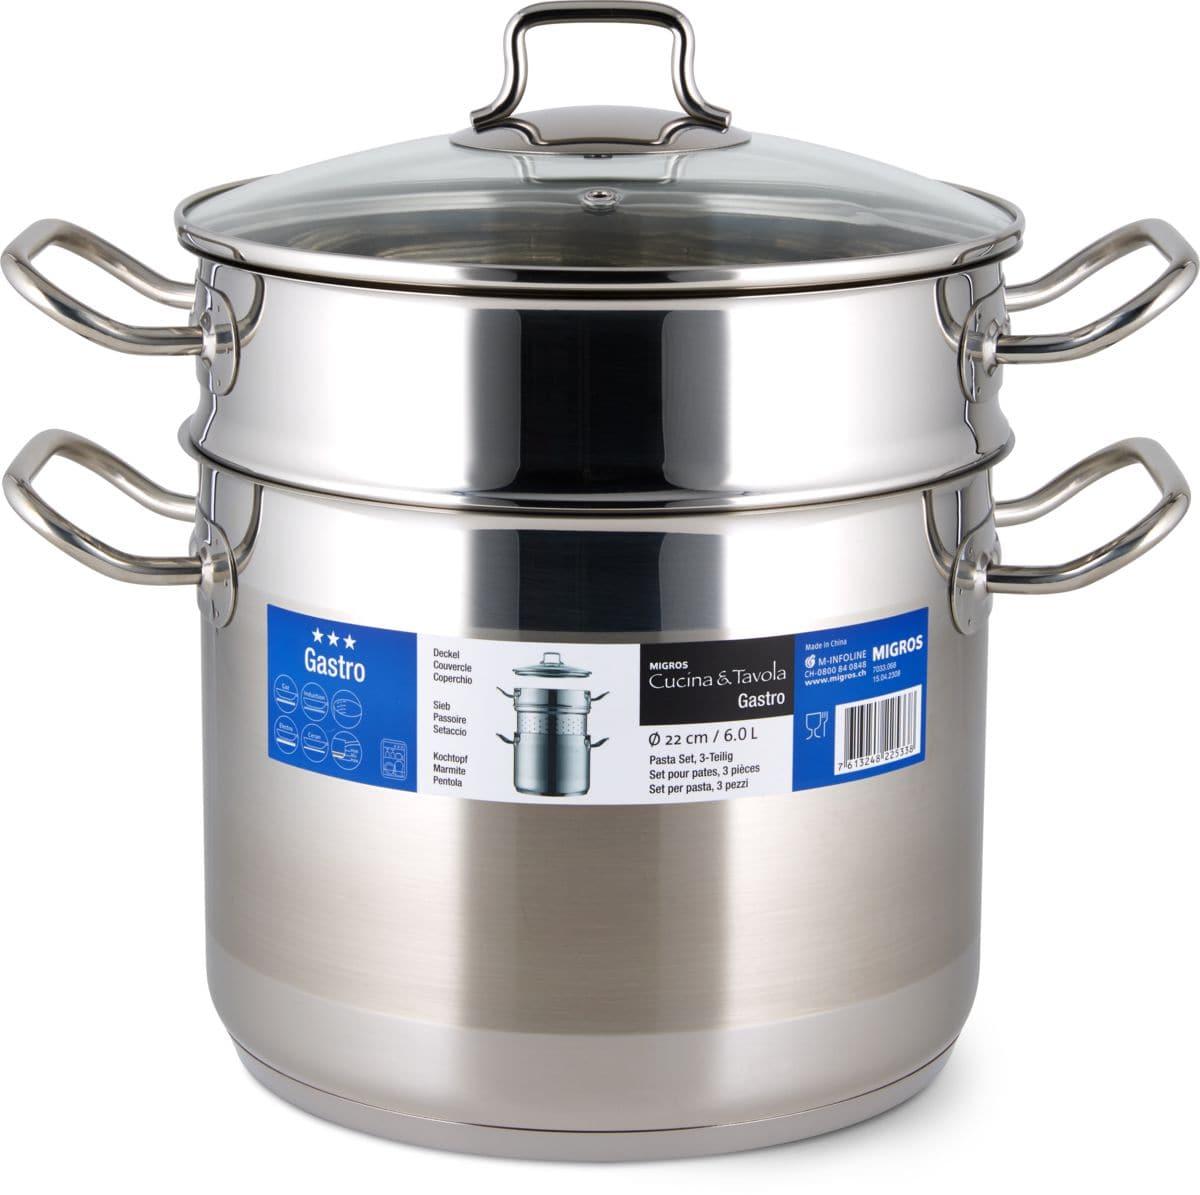 Cucina & Tavola GASTRO Set pour pâtes